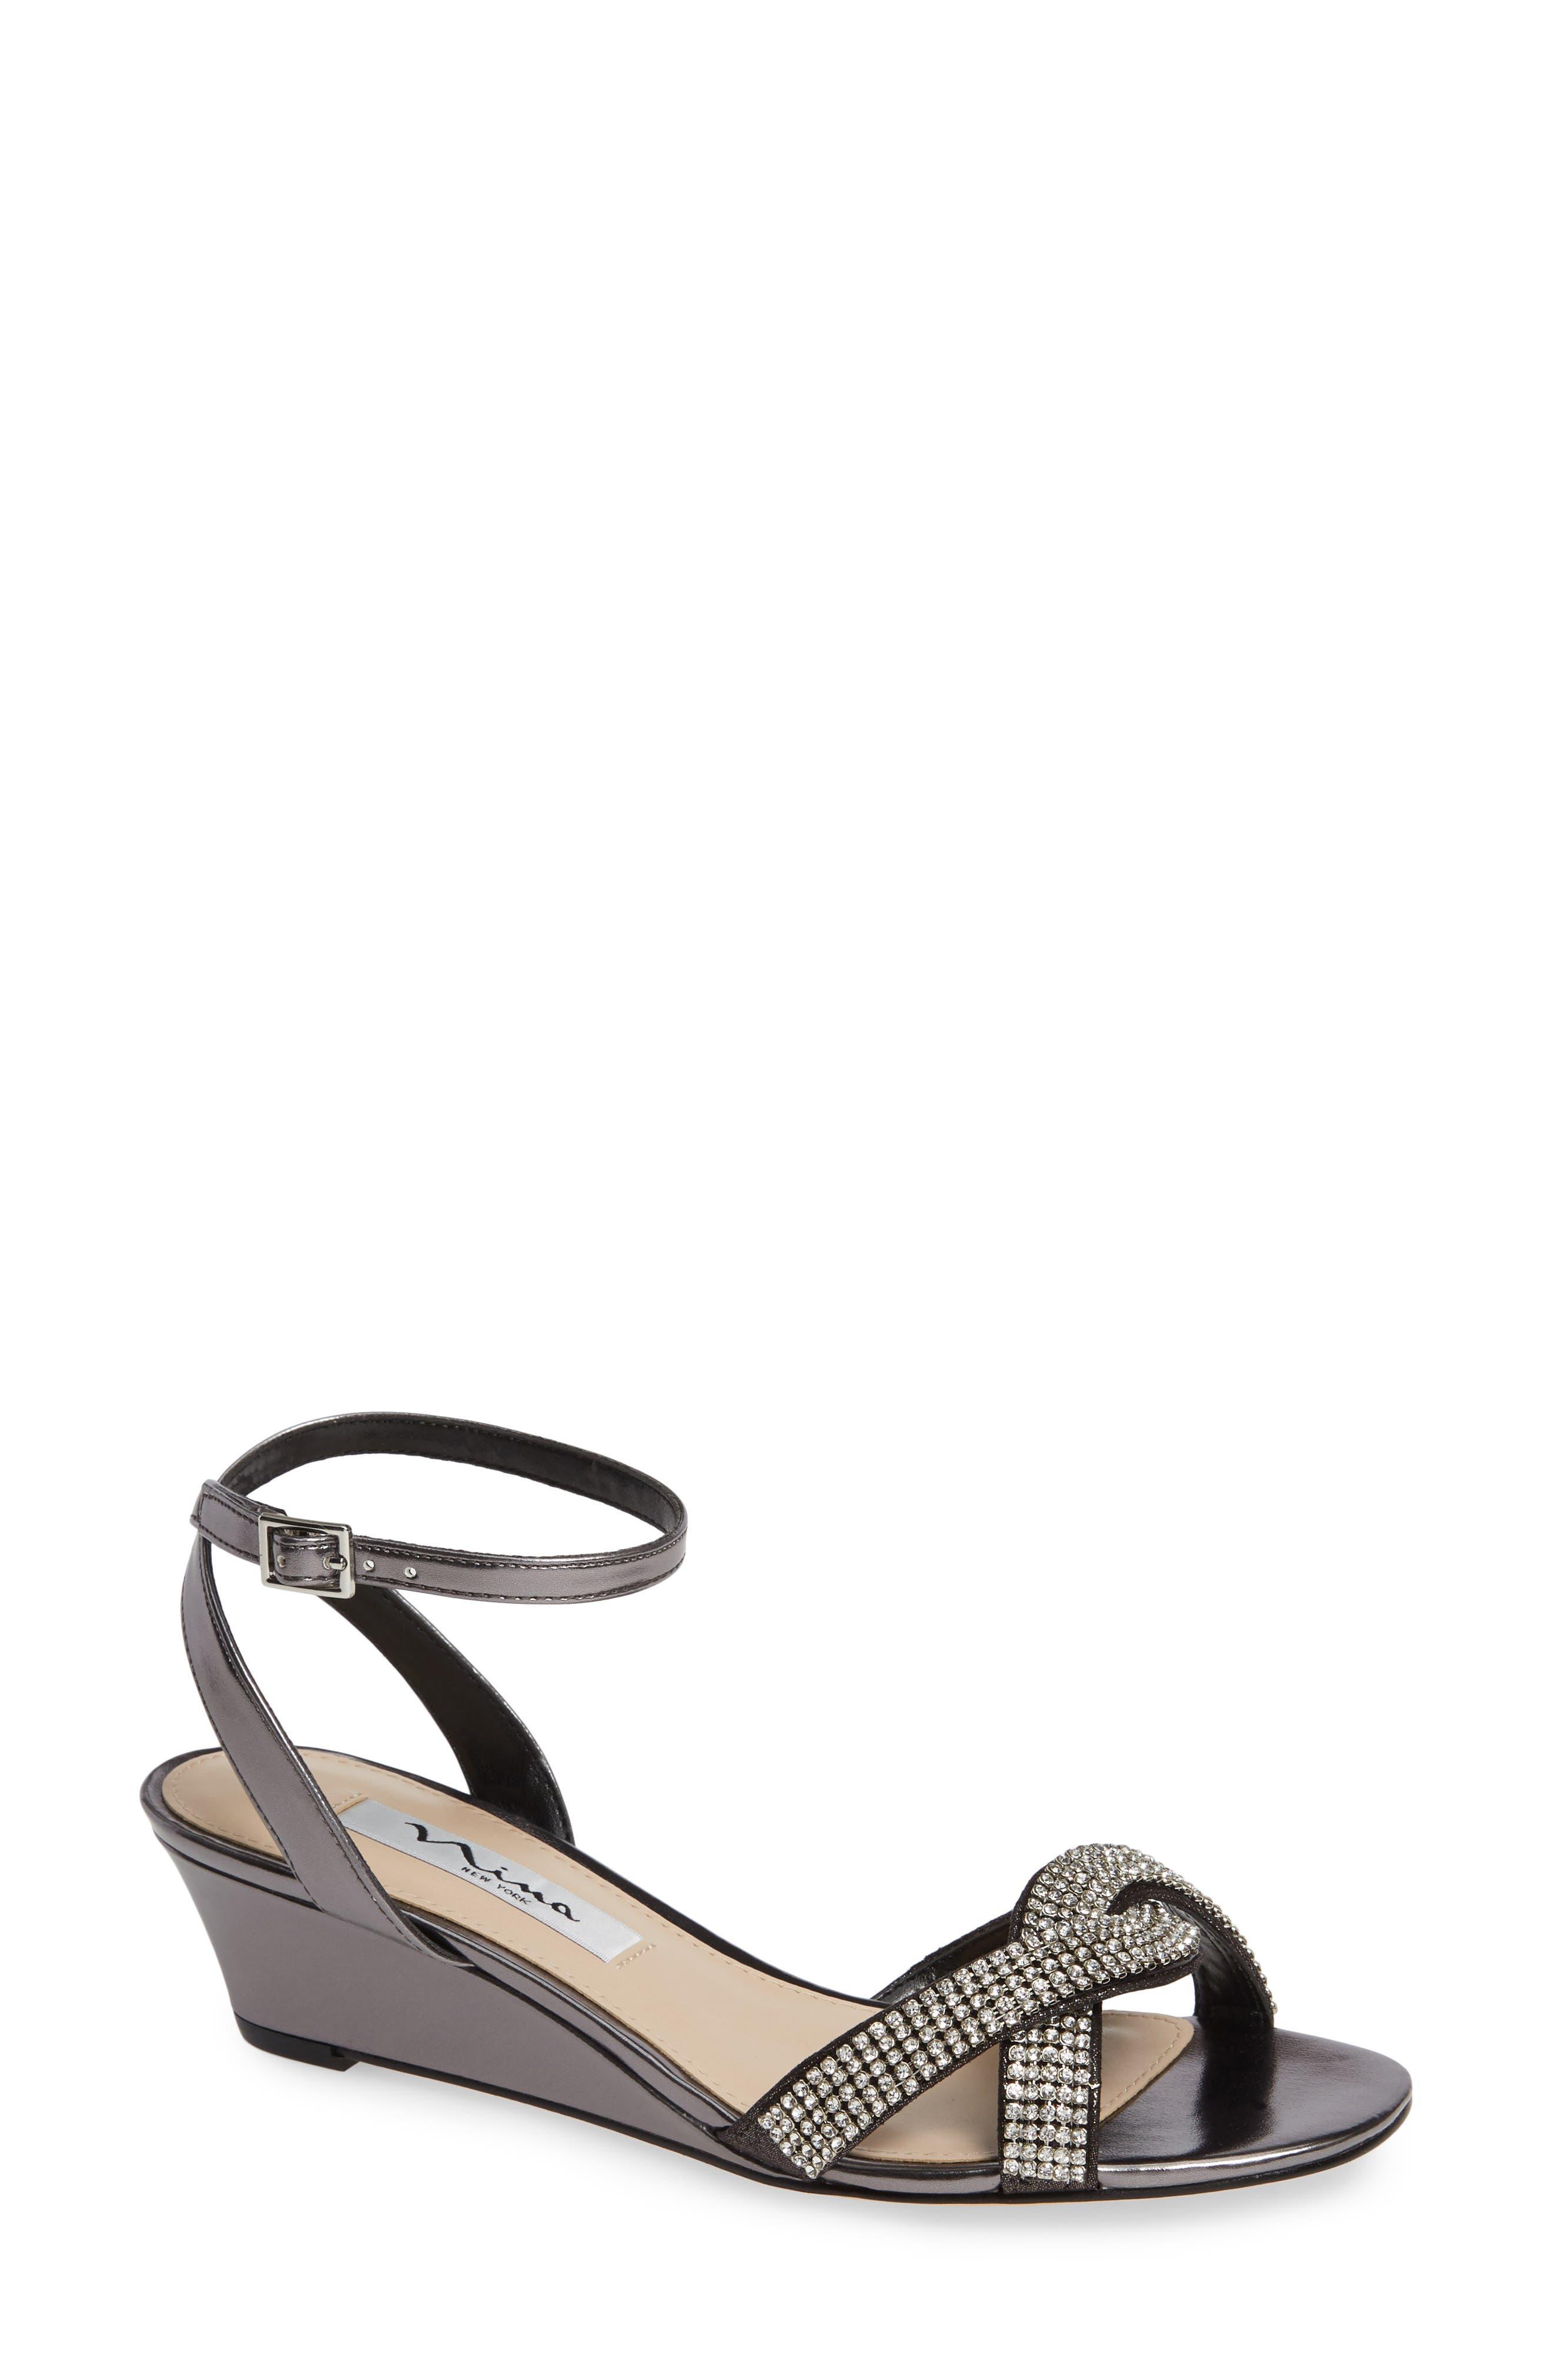 Florina Crystal Embellished Wedge Sandal, Main, color, METALLIC GUNMETAL